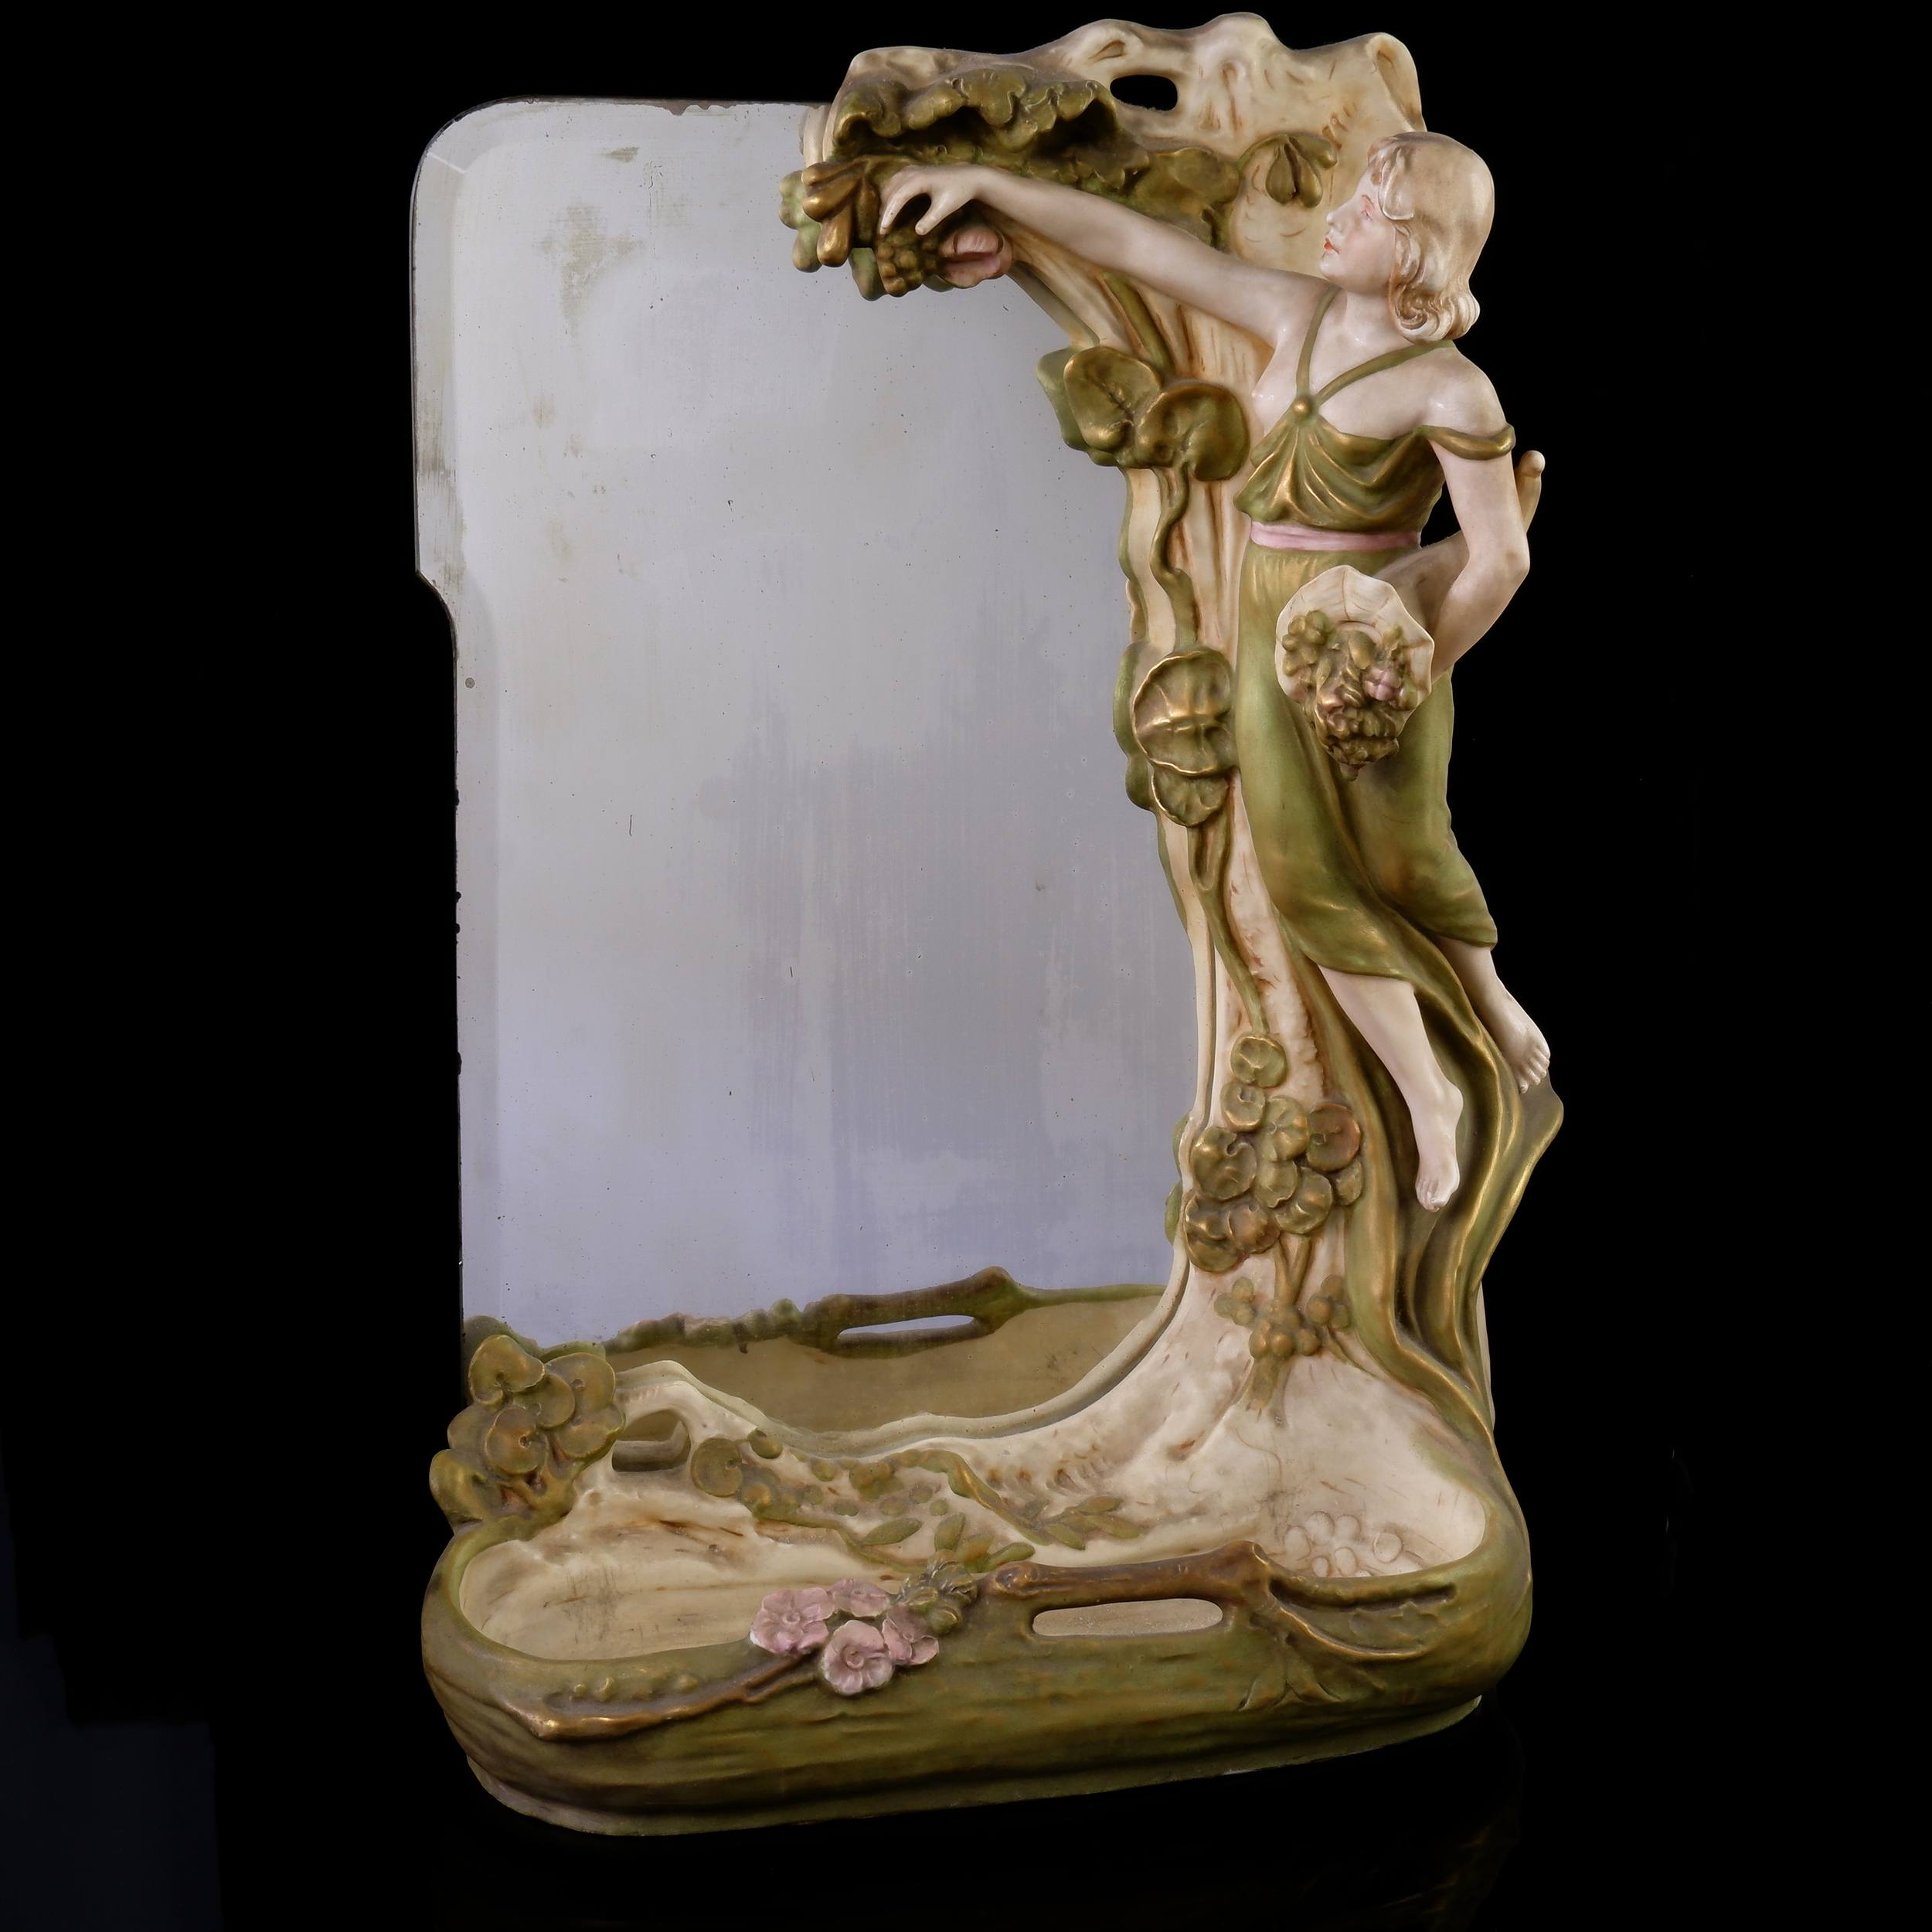 'Art Nouveau Royal Dux Figural Vanity Mirror, Early 20th Century'